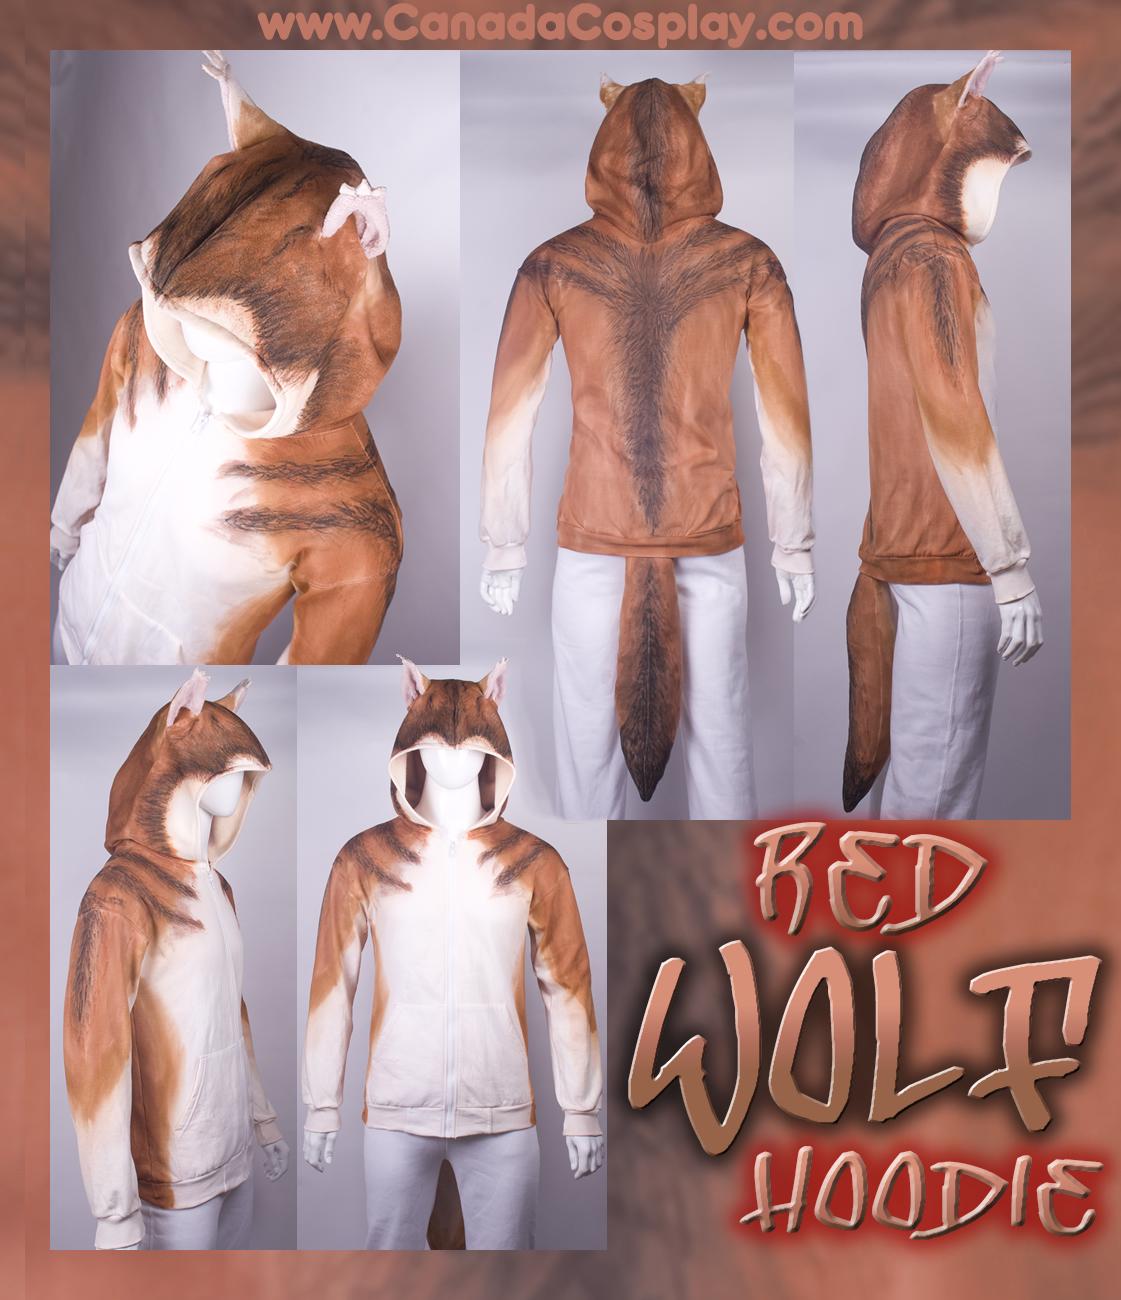 Red Wolf Hoodie by calgarycosplay